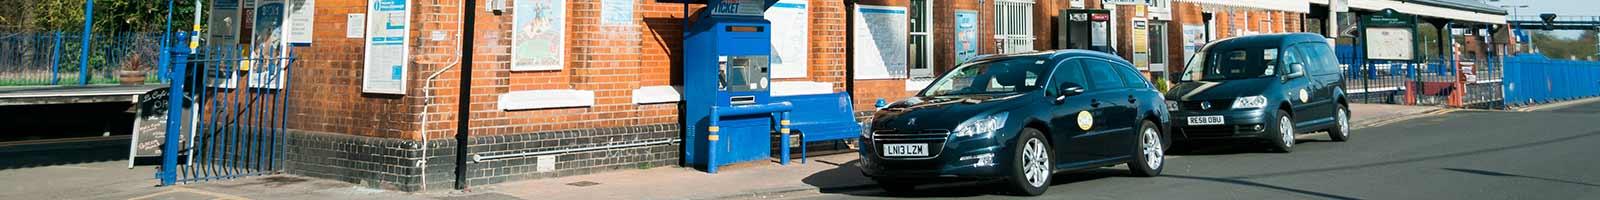 princes risborough train station